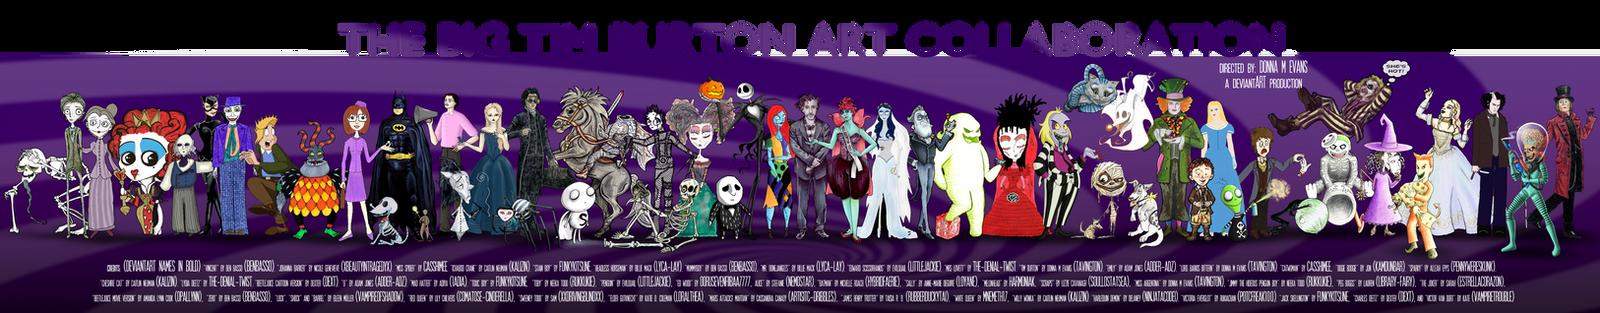 The Big Tim Burton Art Collab by tavington